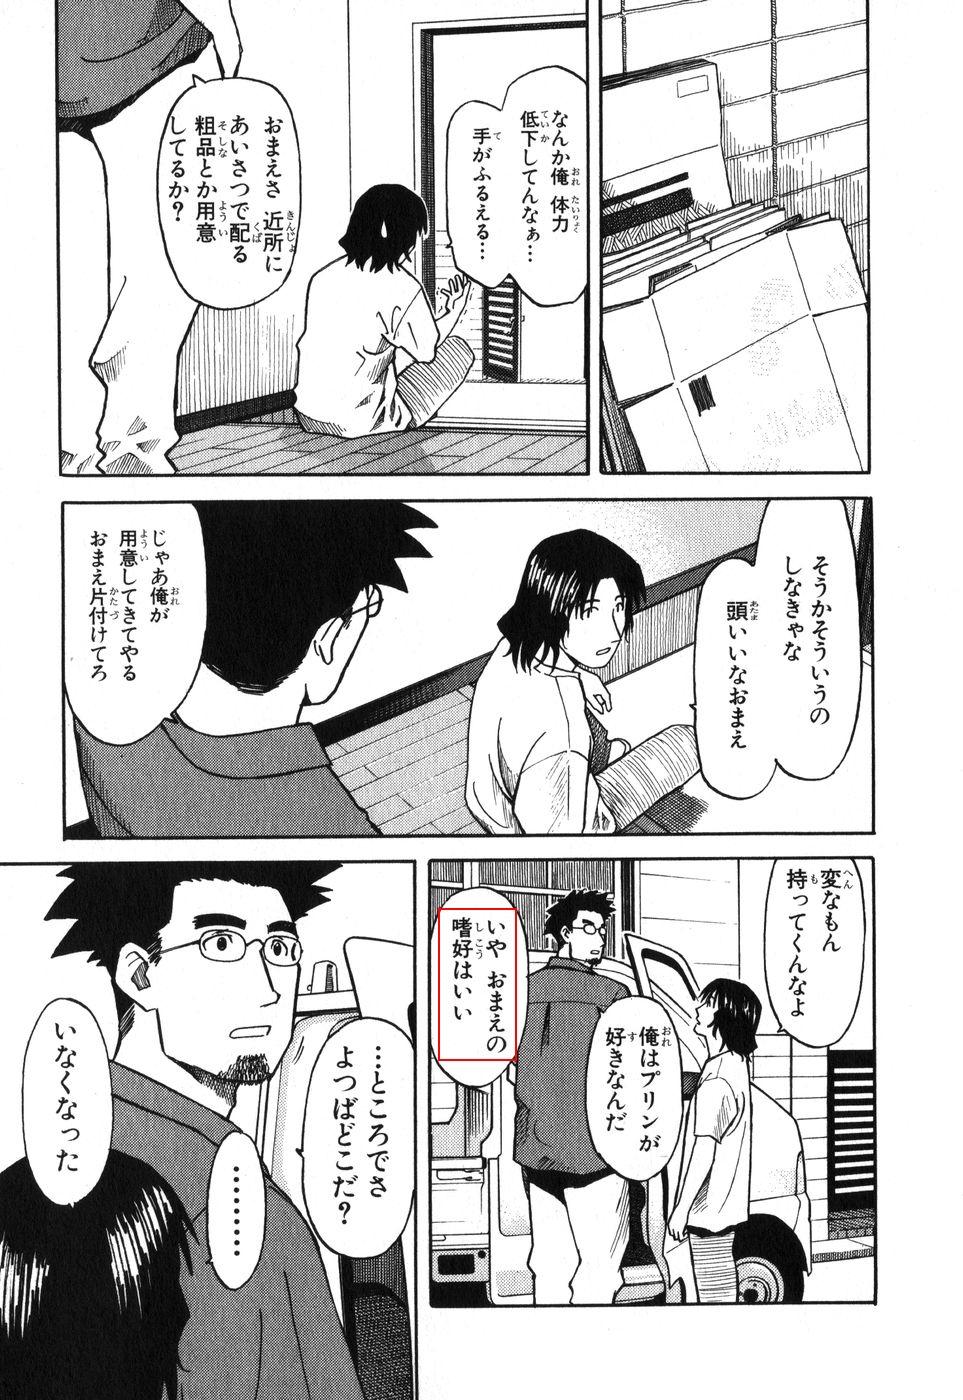 Explain what a mango anime